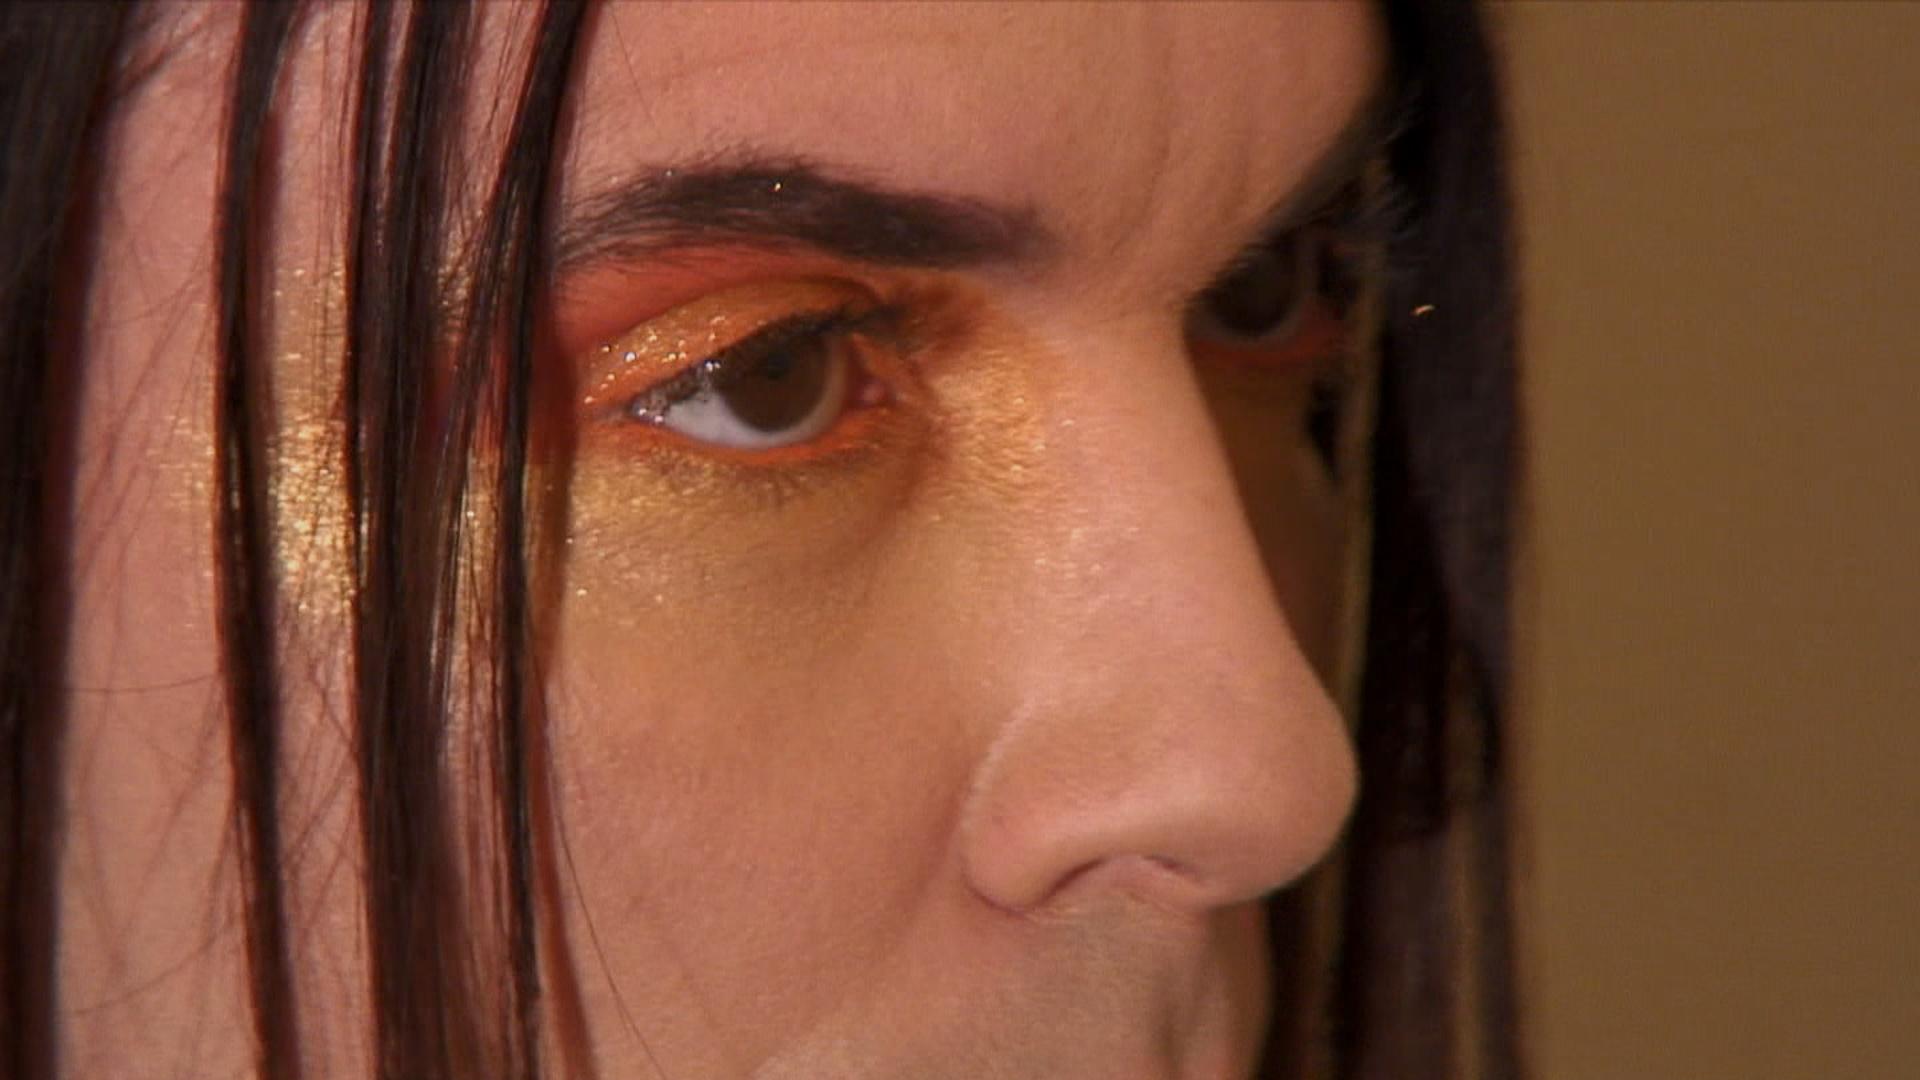 Rohan Quine, 'The Imagination Thief' - film 'JAYMI 115', still 28